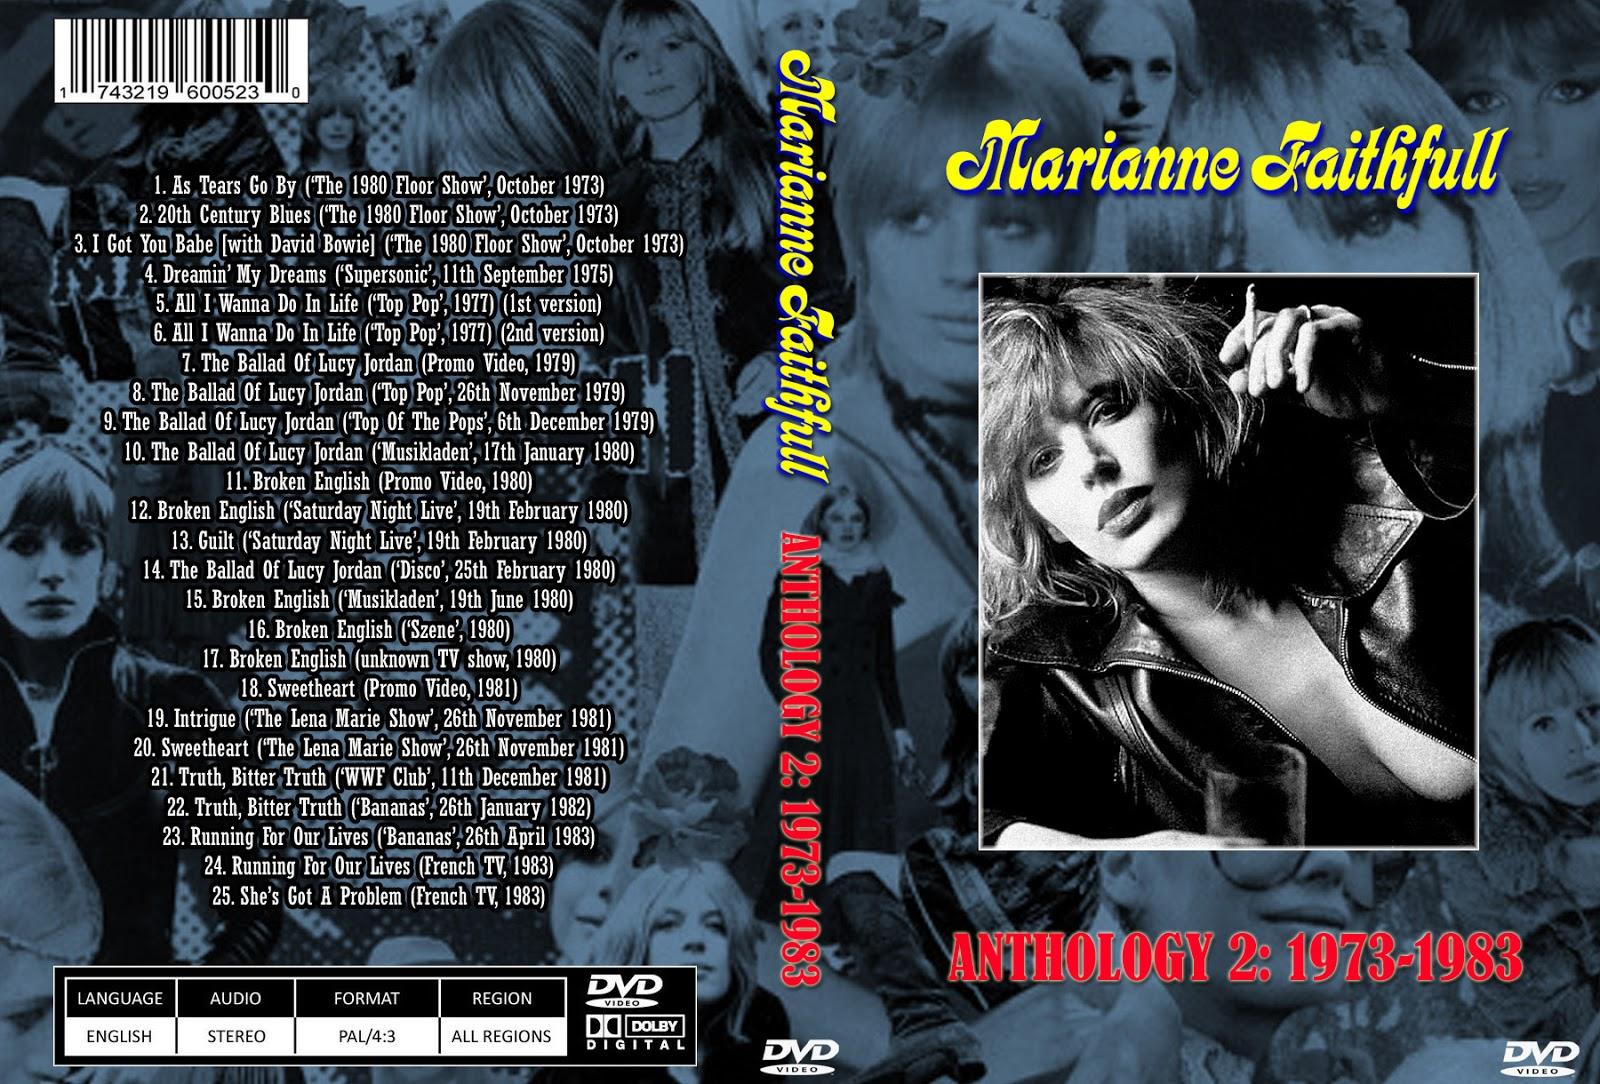 Peter cs music tv video archives marianne faithfull on dvd wanted more marianne faithfull 1964 1983 era preferred altavistaventures Choice Image